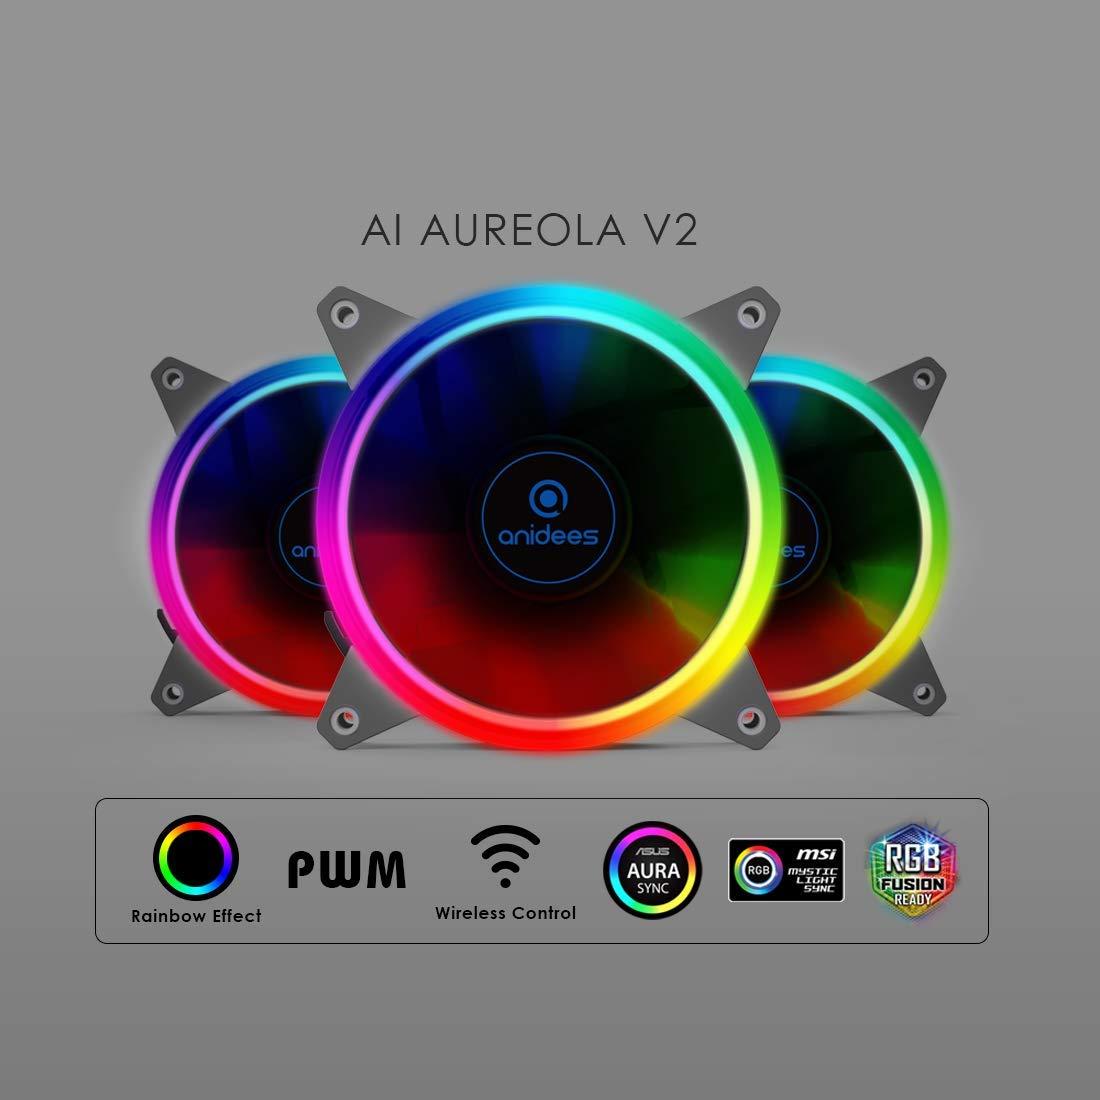 NUR PC-Fall Schwarz 5 x 120 PWM RGB L/üfter // 2 x RGB LED Streifen anidees AI Crystal XL RGB V3 Full Tower Geh/ärtetes Glas XL-ATX//E-ATX//ATX PC Gaming Geh/äuse Unterst/ützung 480//360-K/ühler